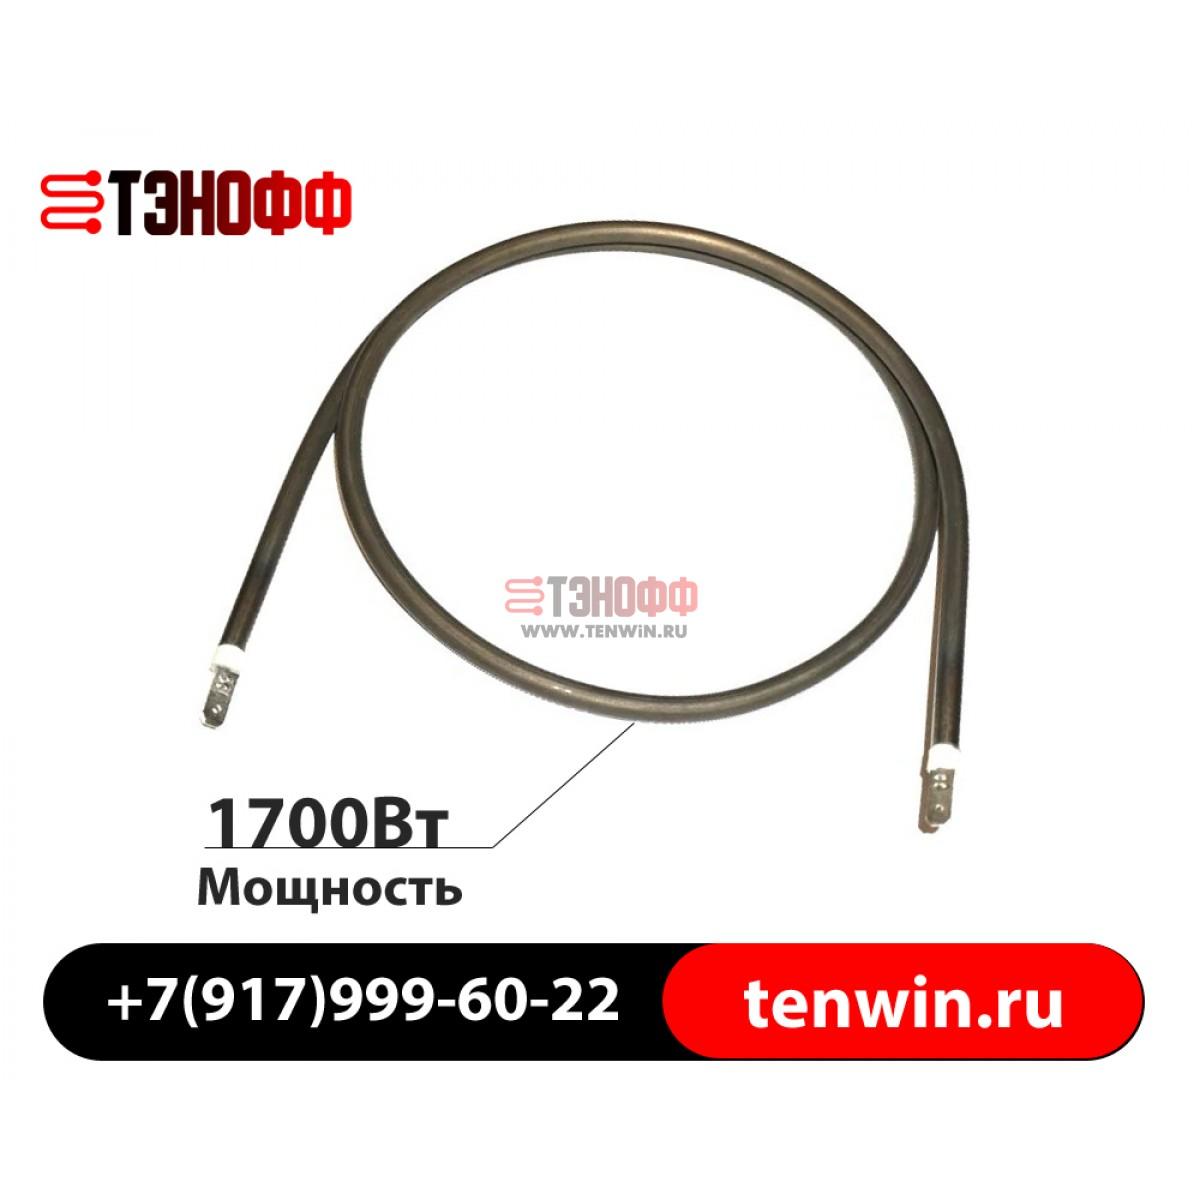 ТЭН 1700Вт воздушный гибкий - длина 1700мм